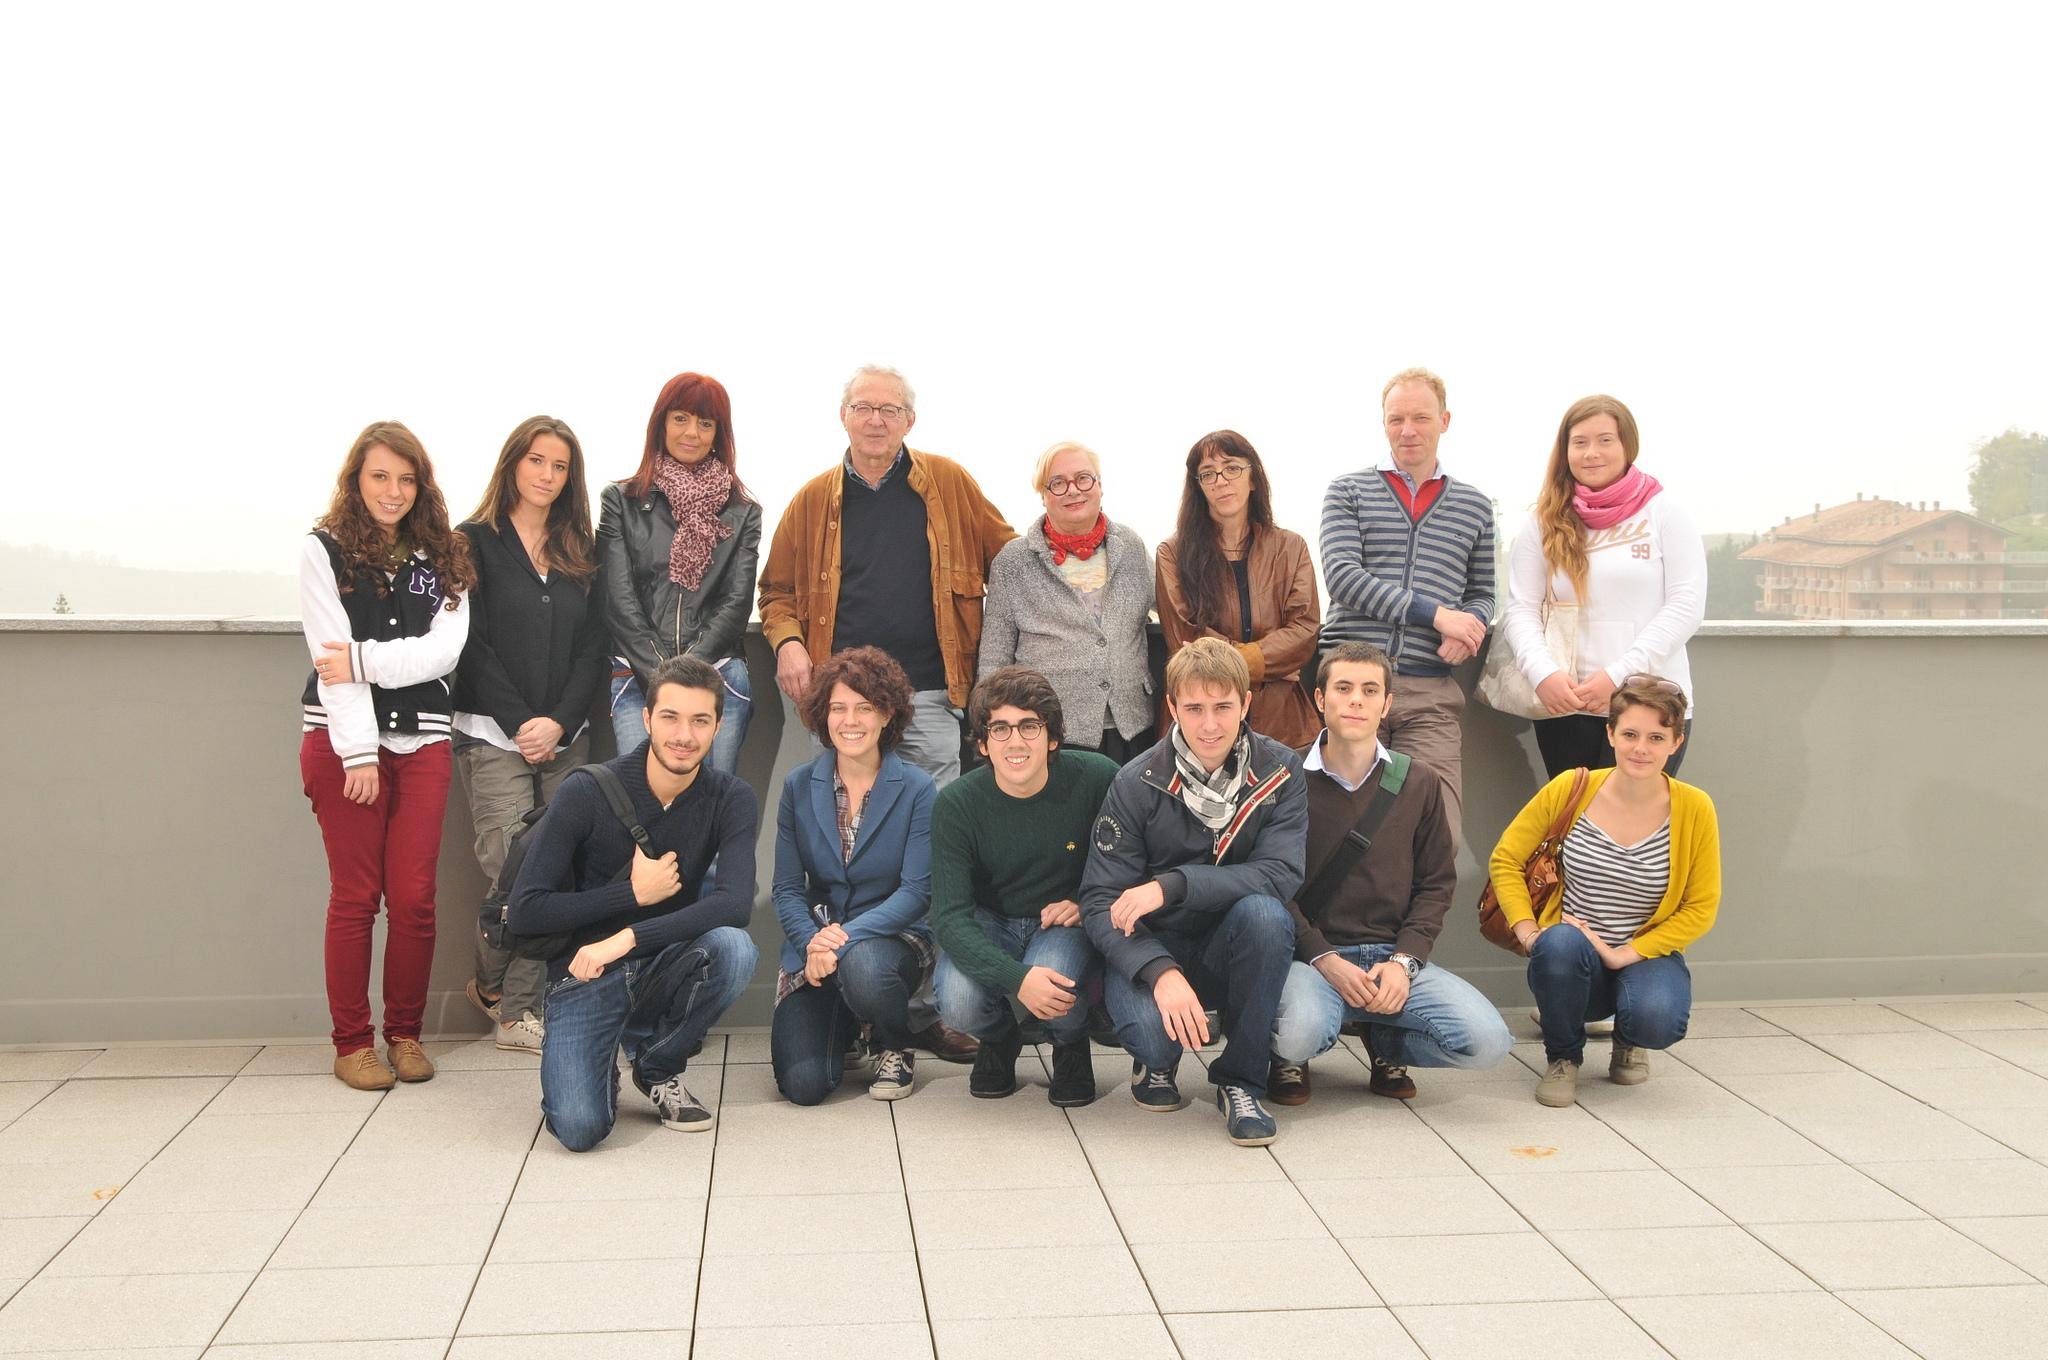 premio-bottari-lattes-grinzane-2012